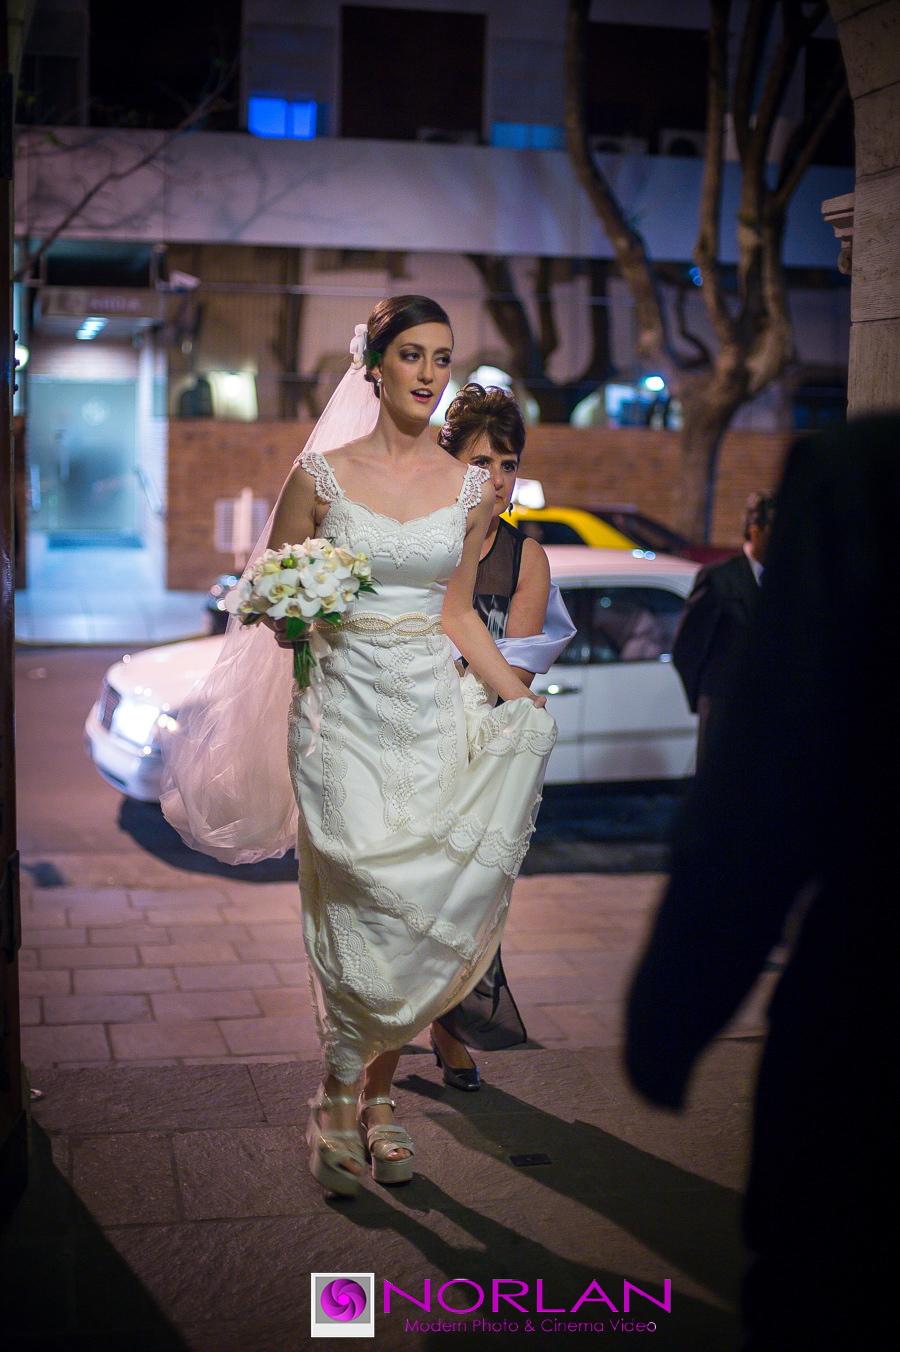 Fotos bodas-casamientos norlan-fotos de bodas en bs as- fotos de norlan estudio-fotos de moderm photo y cinema video-fotografias de bodas -fotos de novias_25